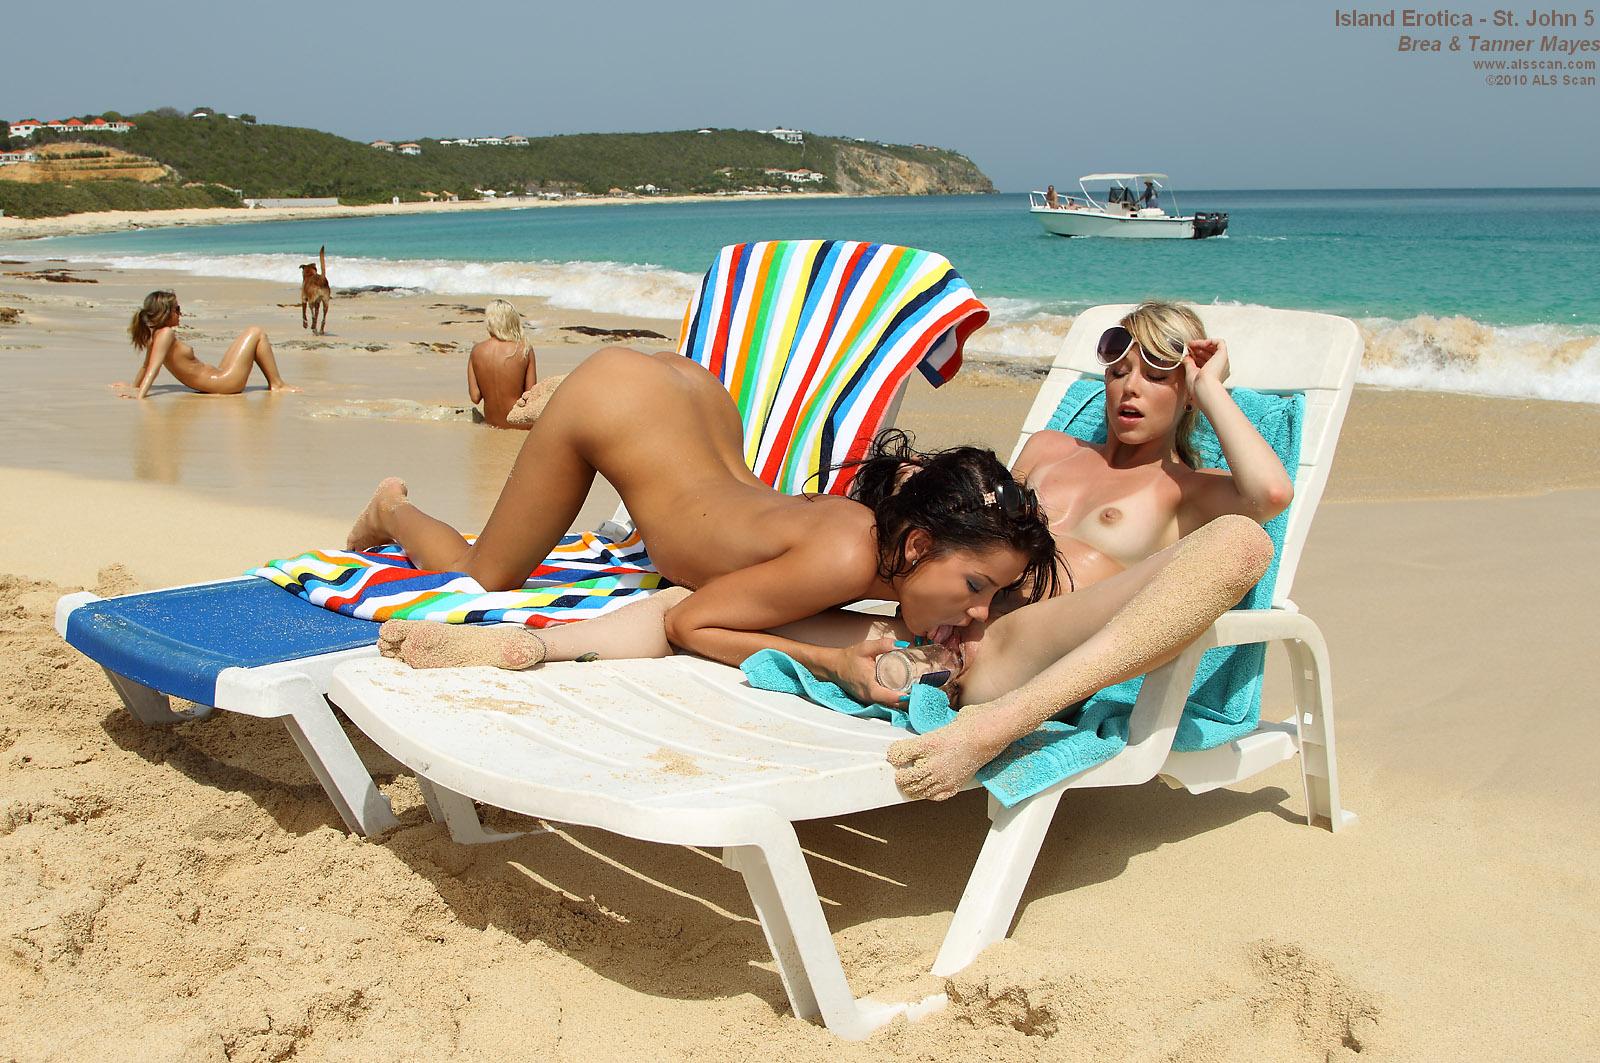 Лесби фото на пляже